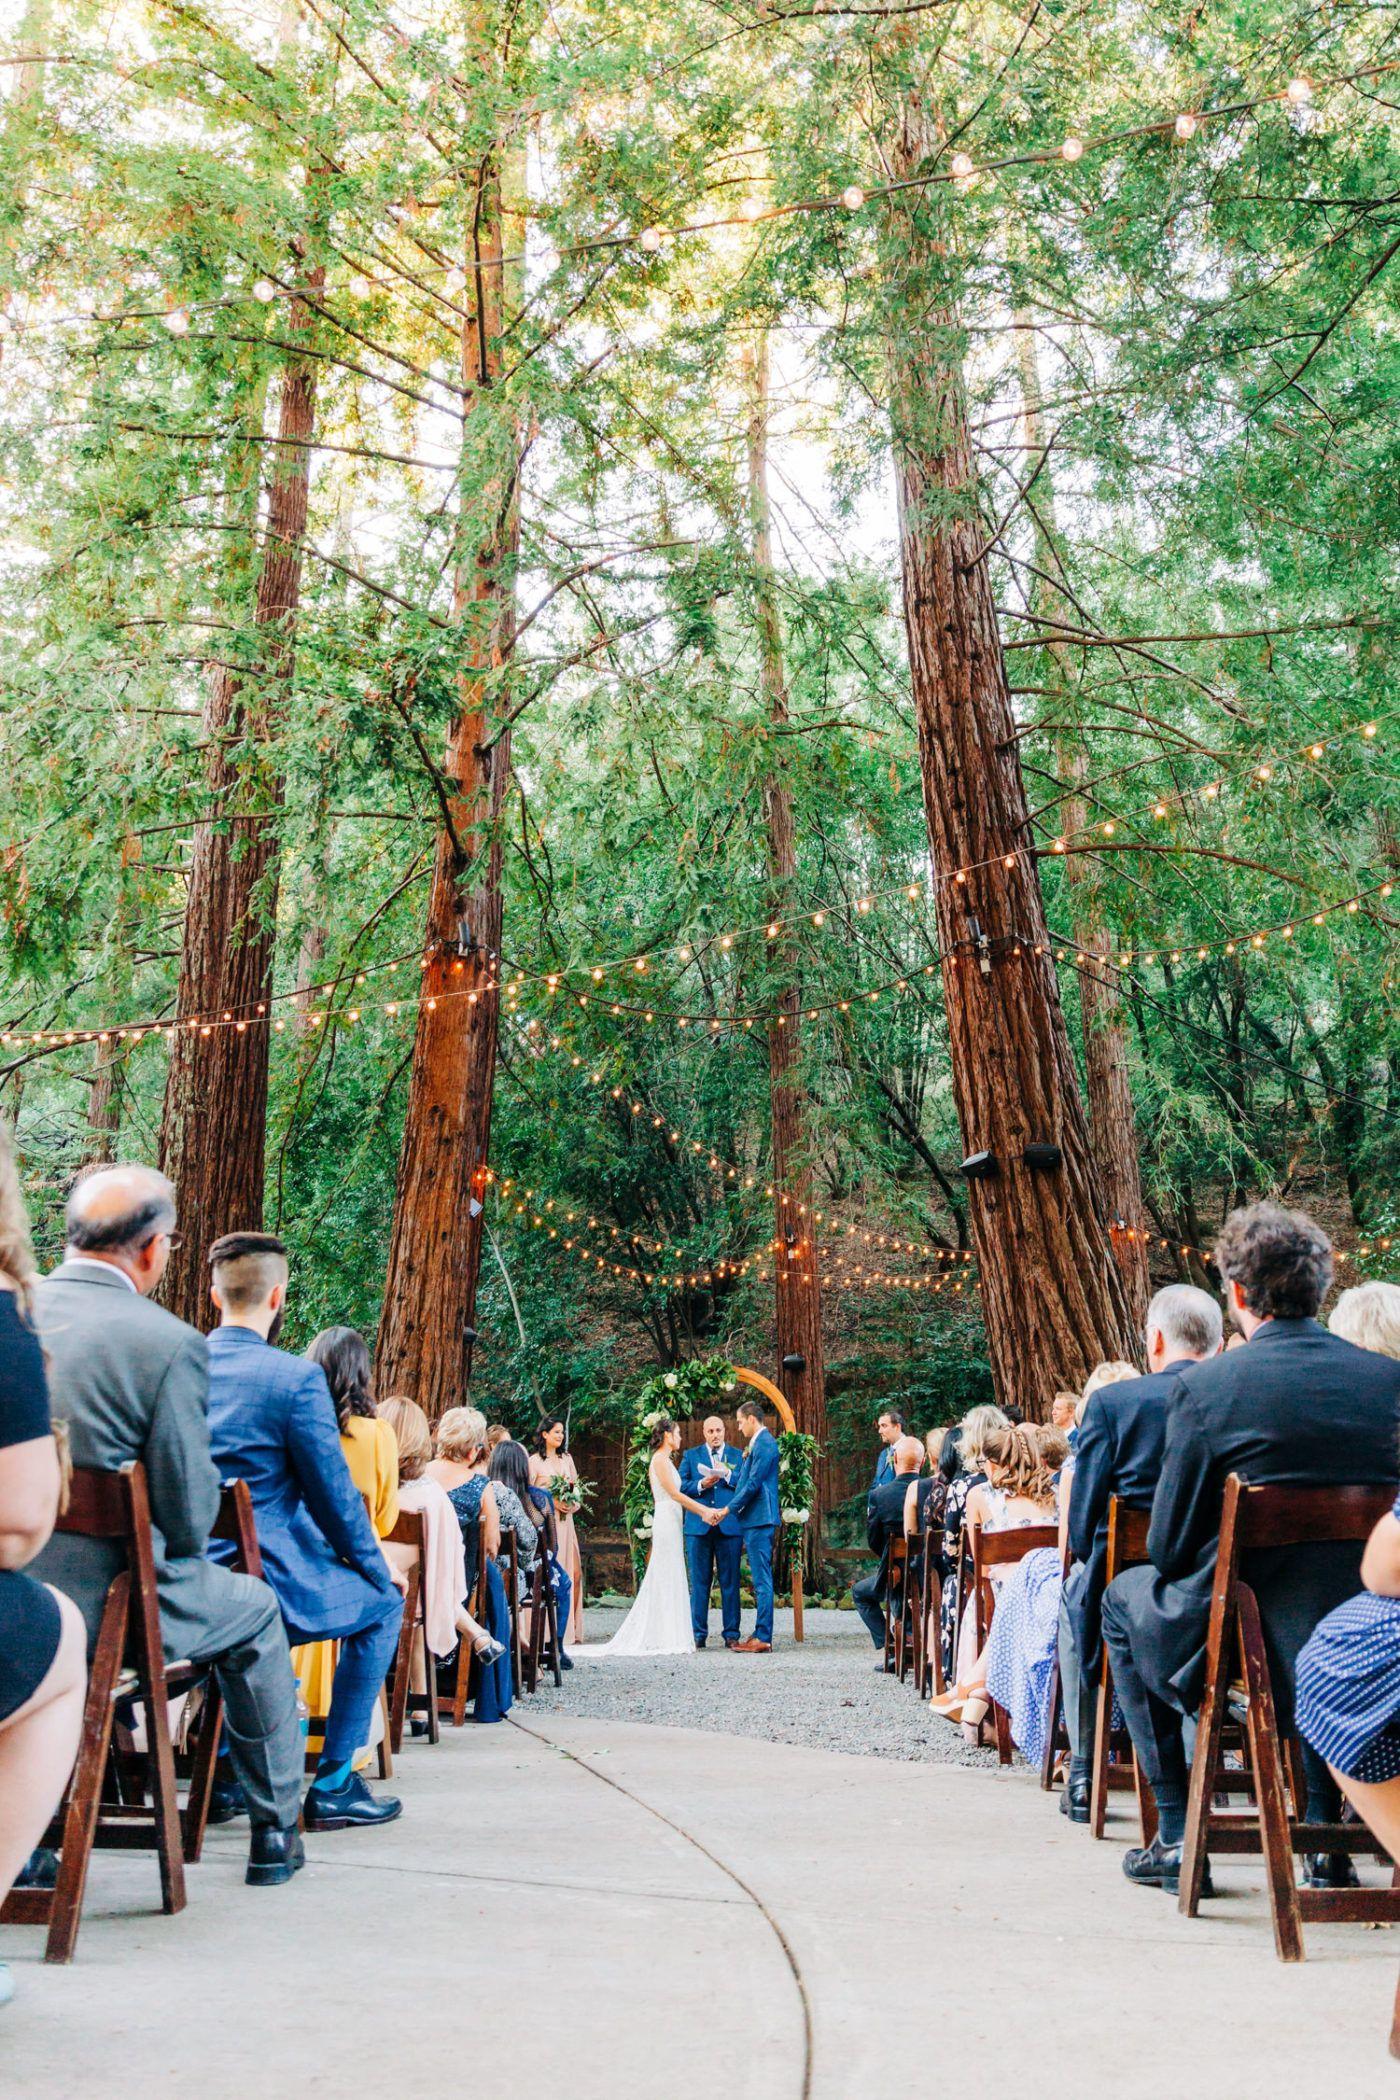 25+ Outdoor wedding venues northern illinois information